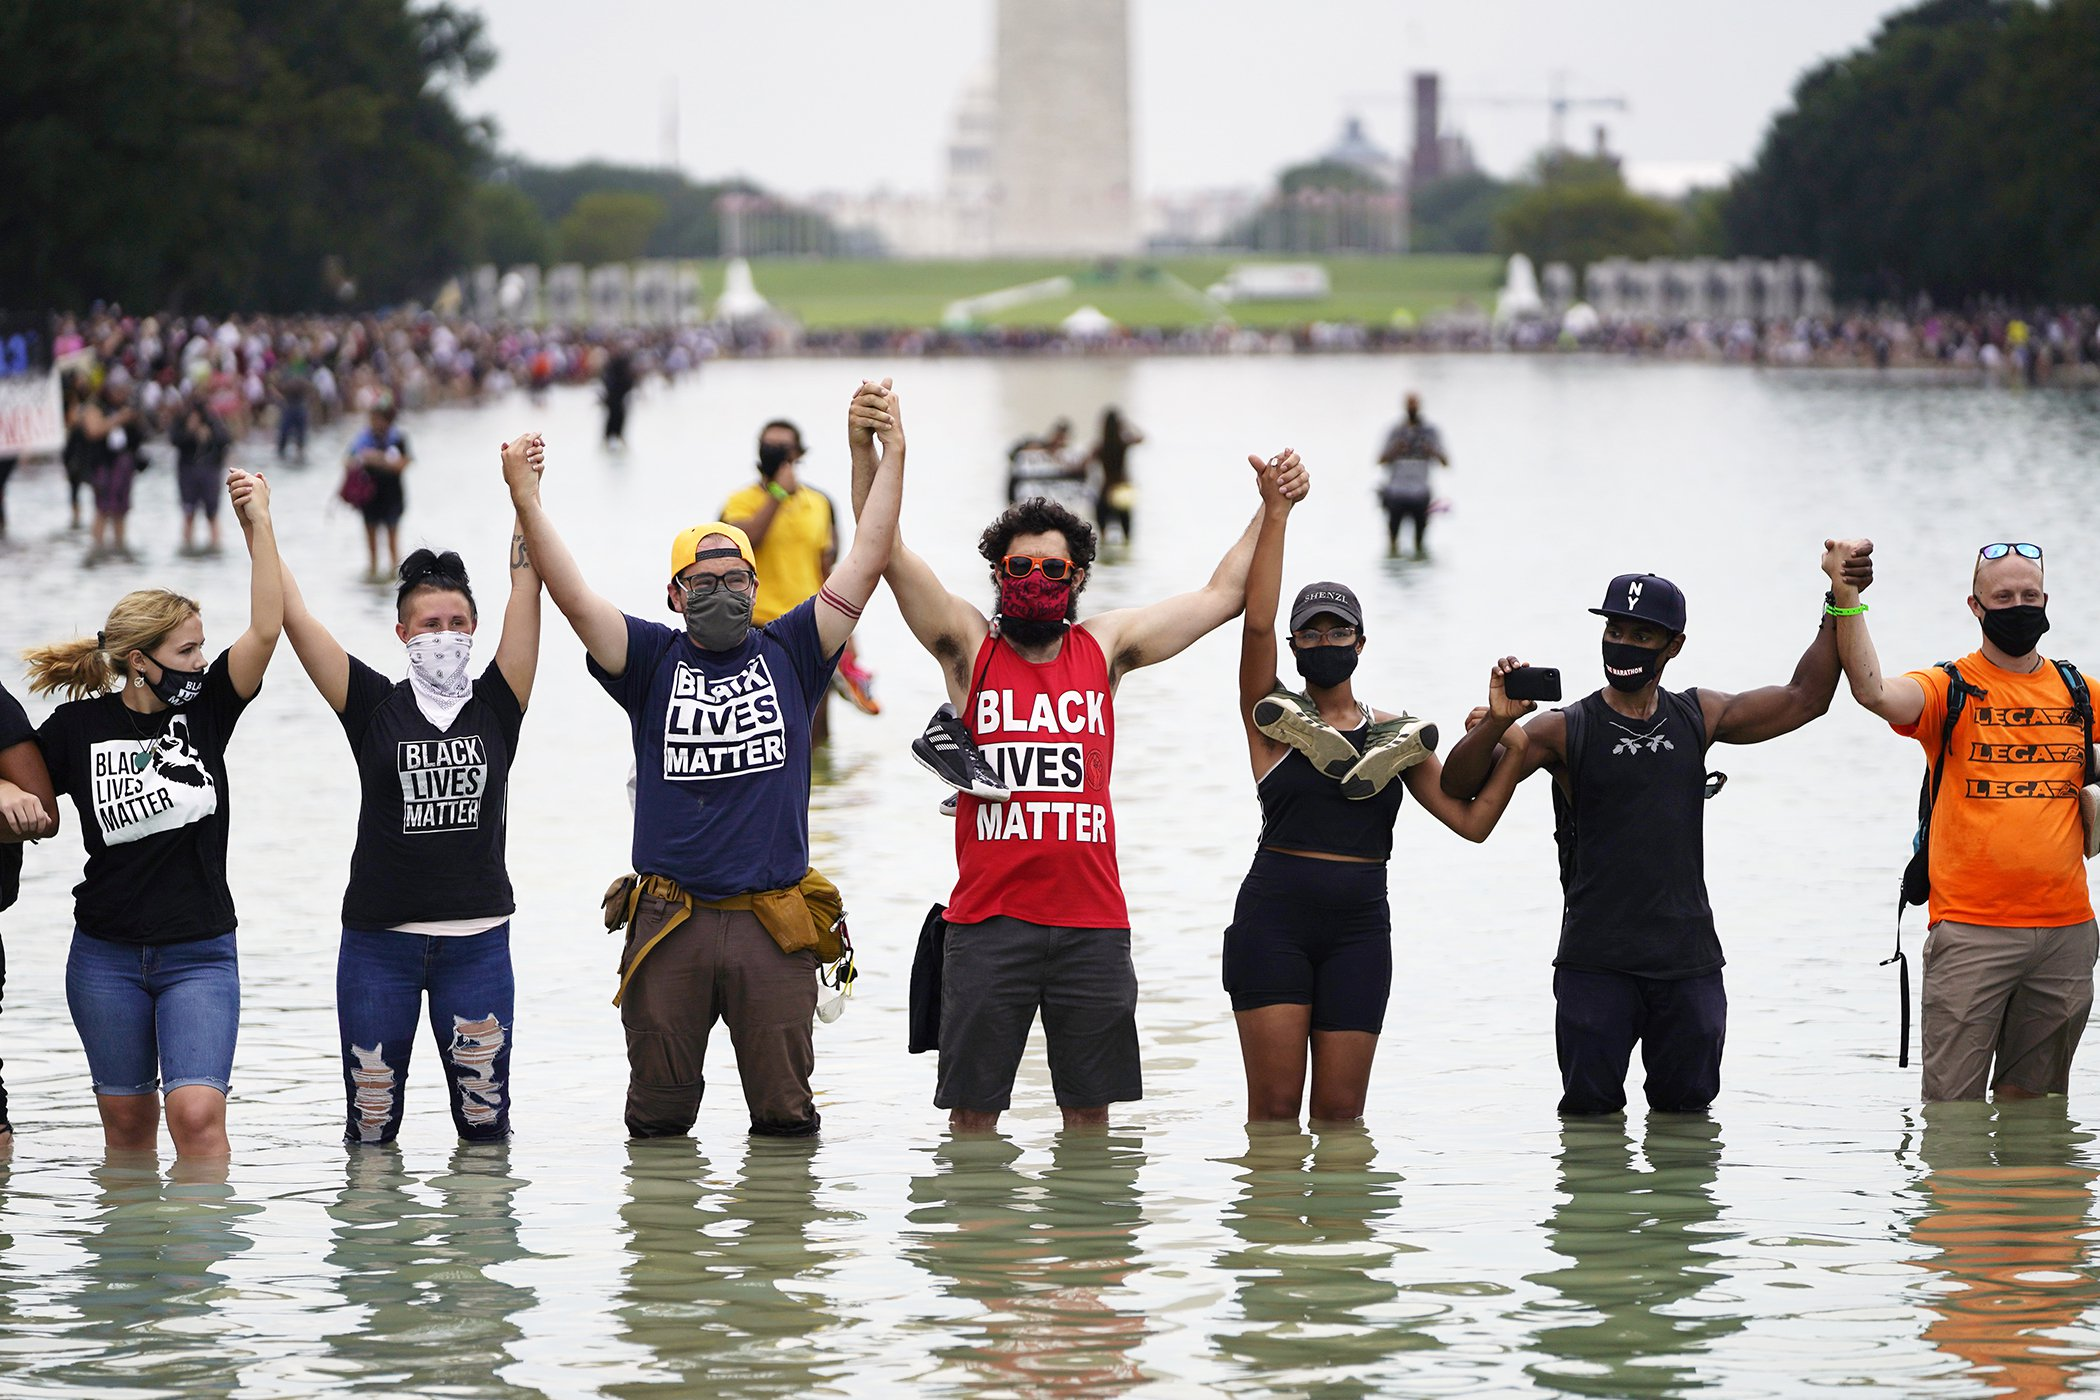 March-On-Washington-2020-Racial-Injustice-Black-Lives-Matter-001.jpg